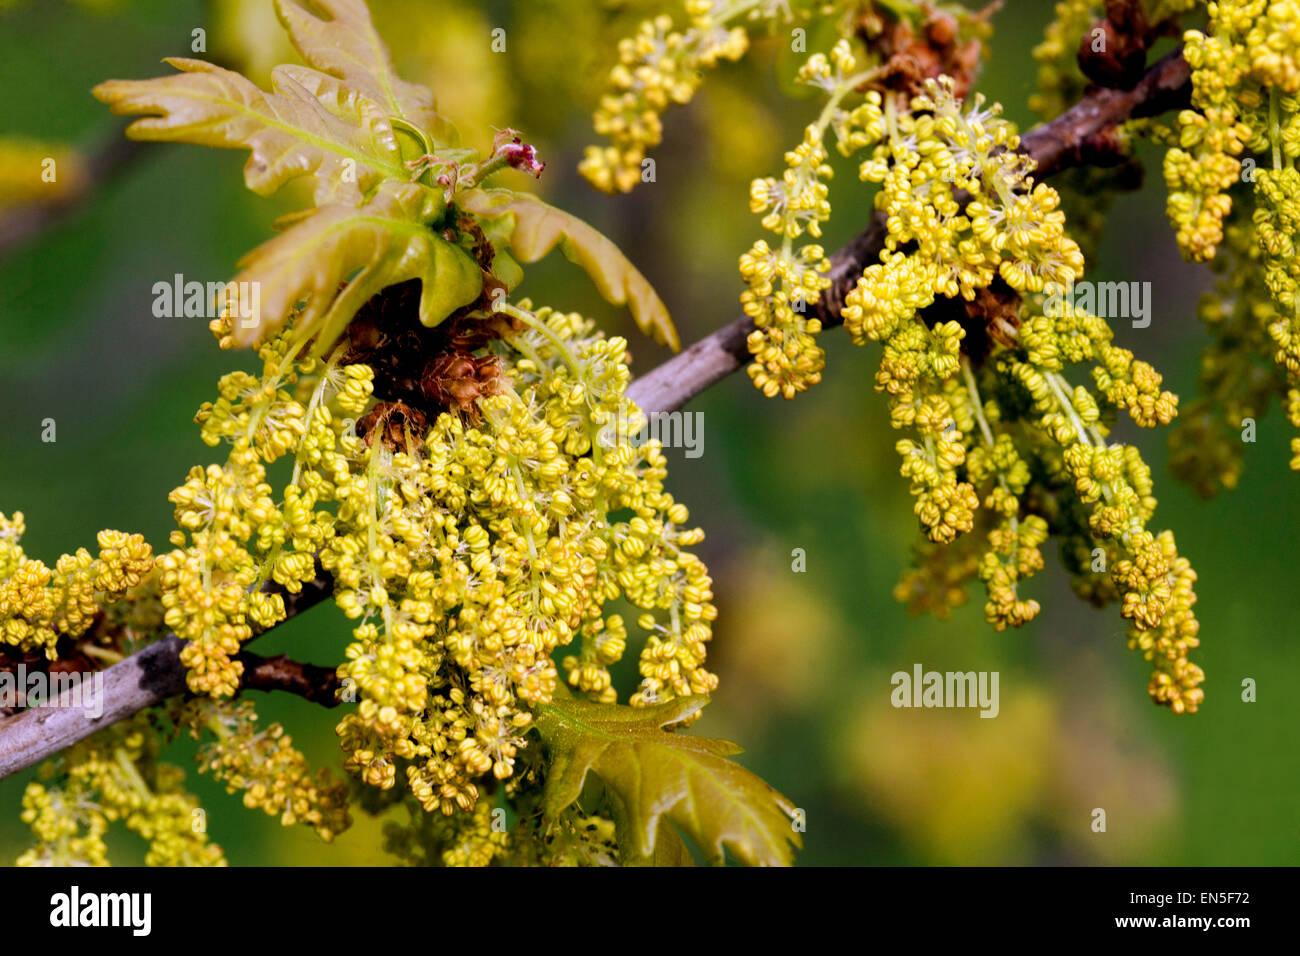 English oak, Quercus robur - Stock Image